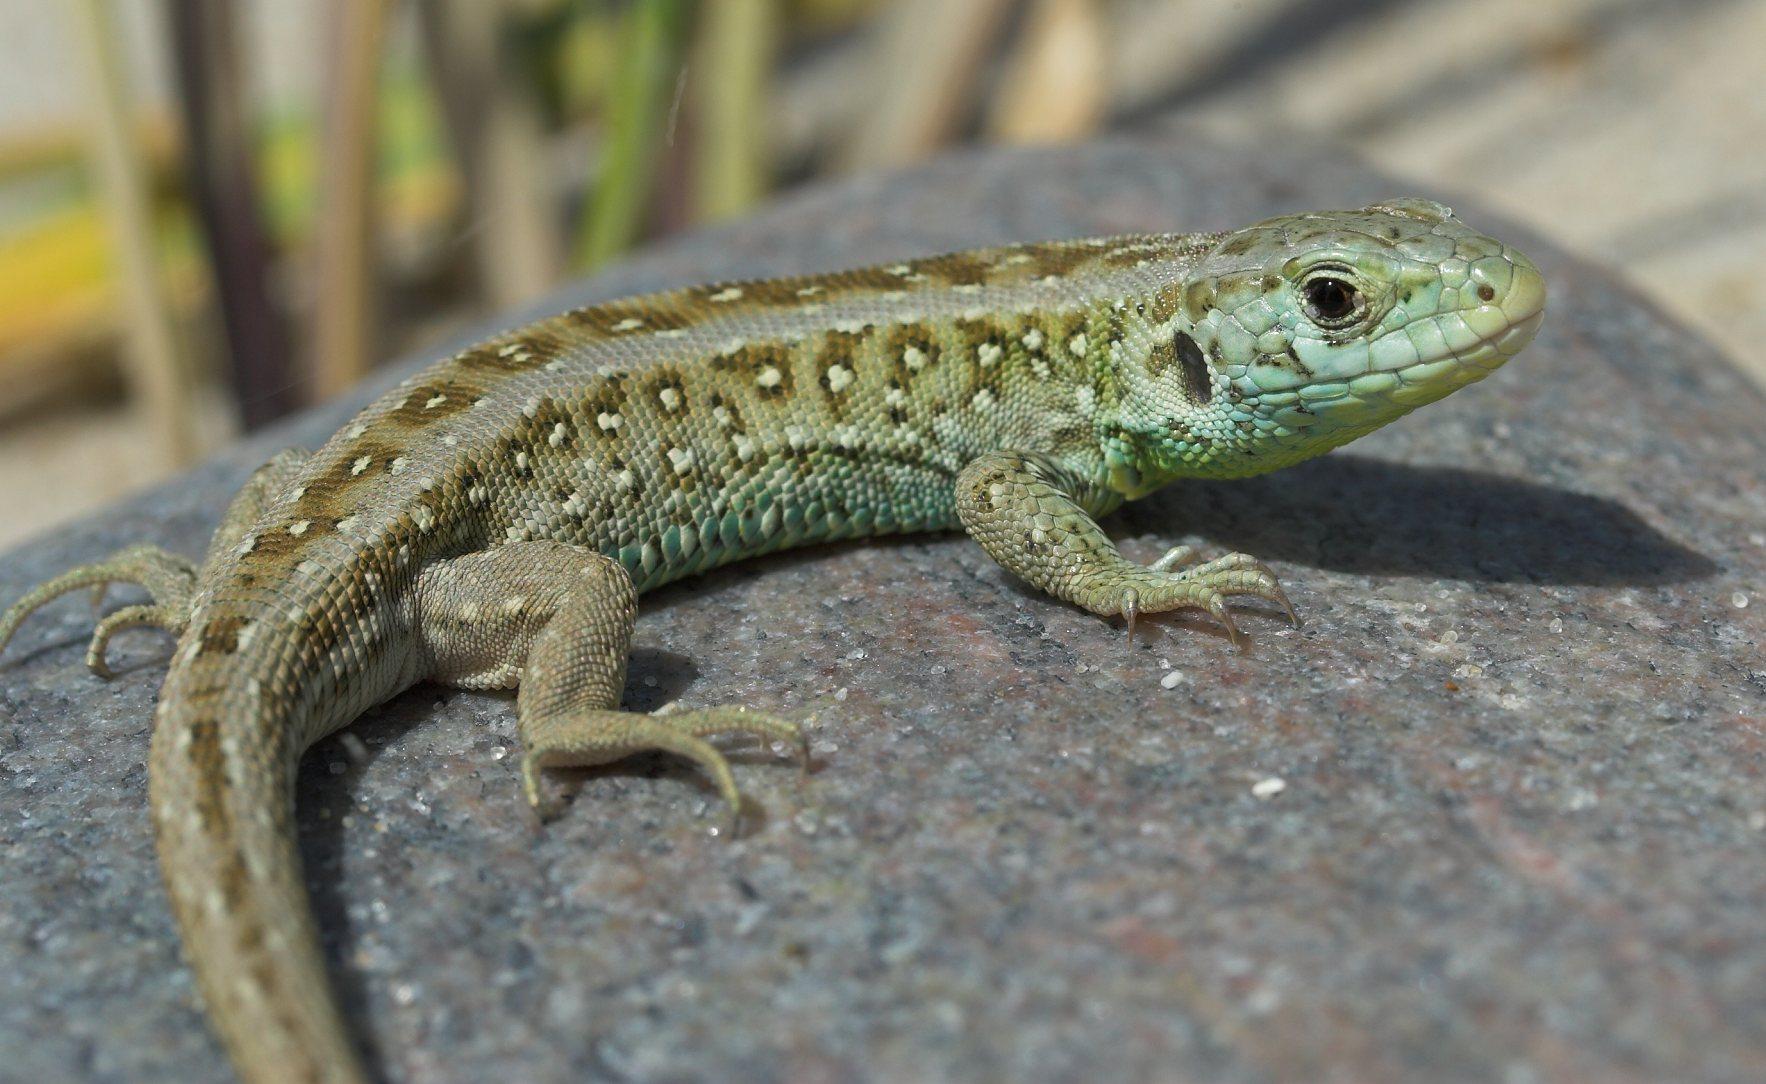 Lizards of Denmark